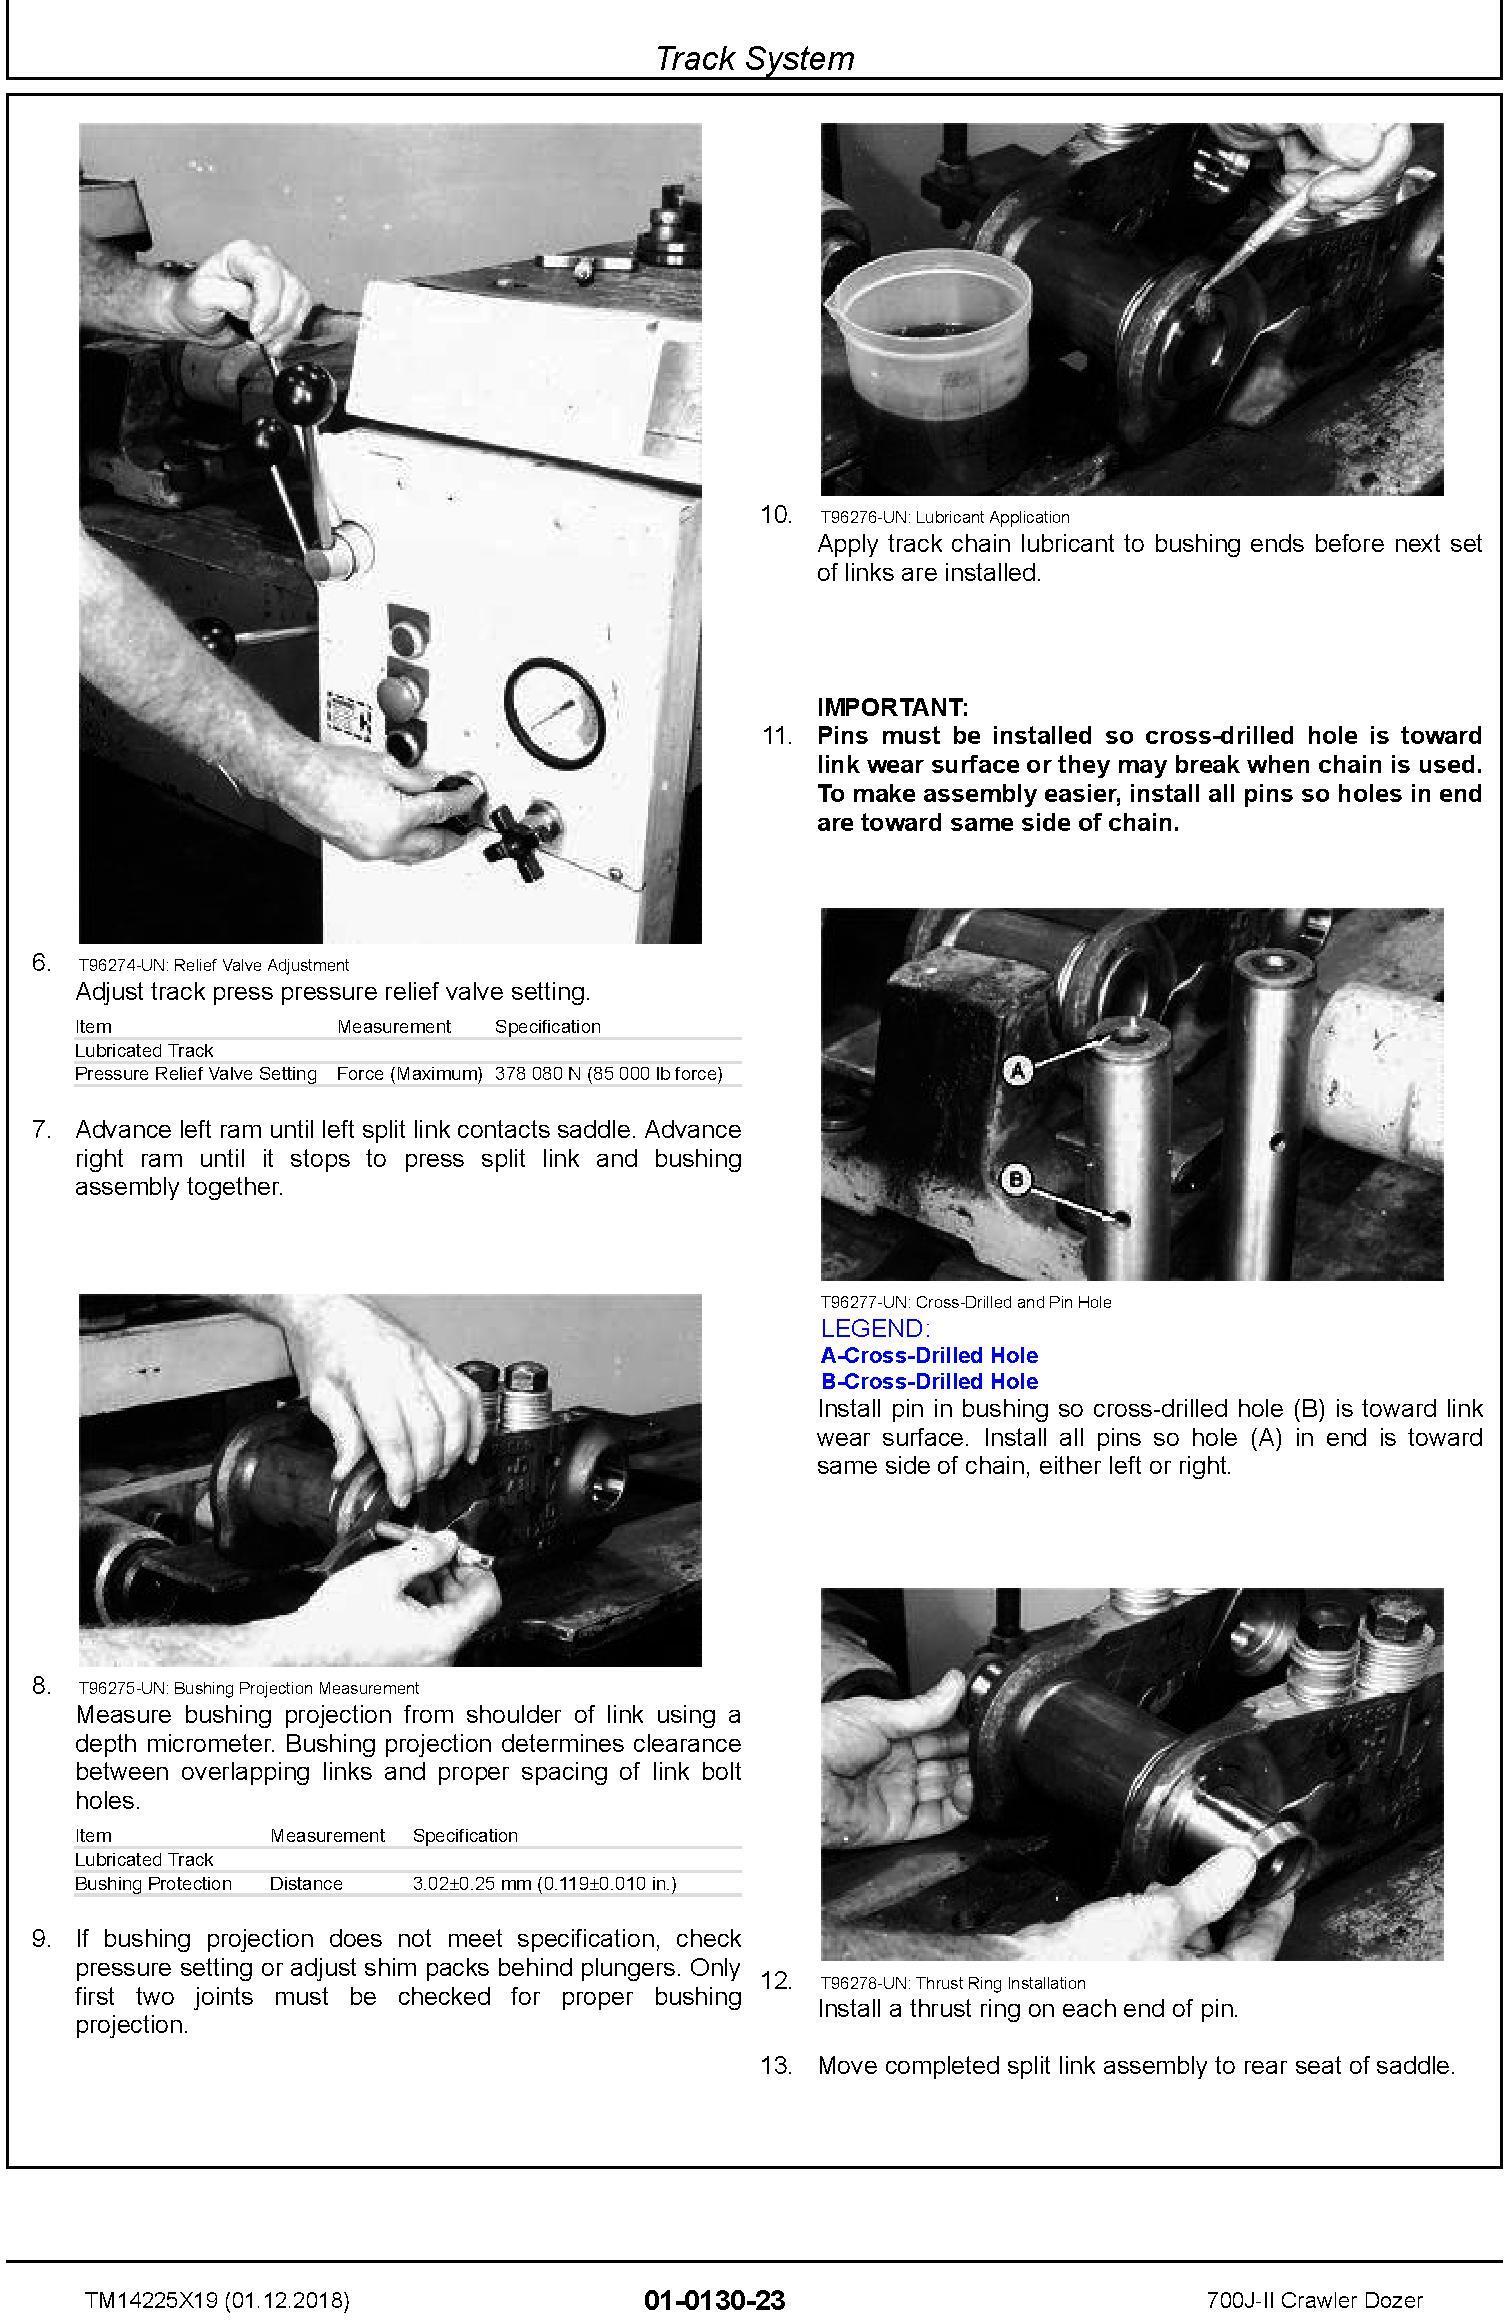 John Deere 700J-II (SN. From D306726) Crawler Dozer Repair Technical Service Manual (TM14225X19) - 2